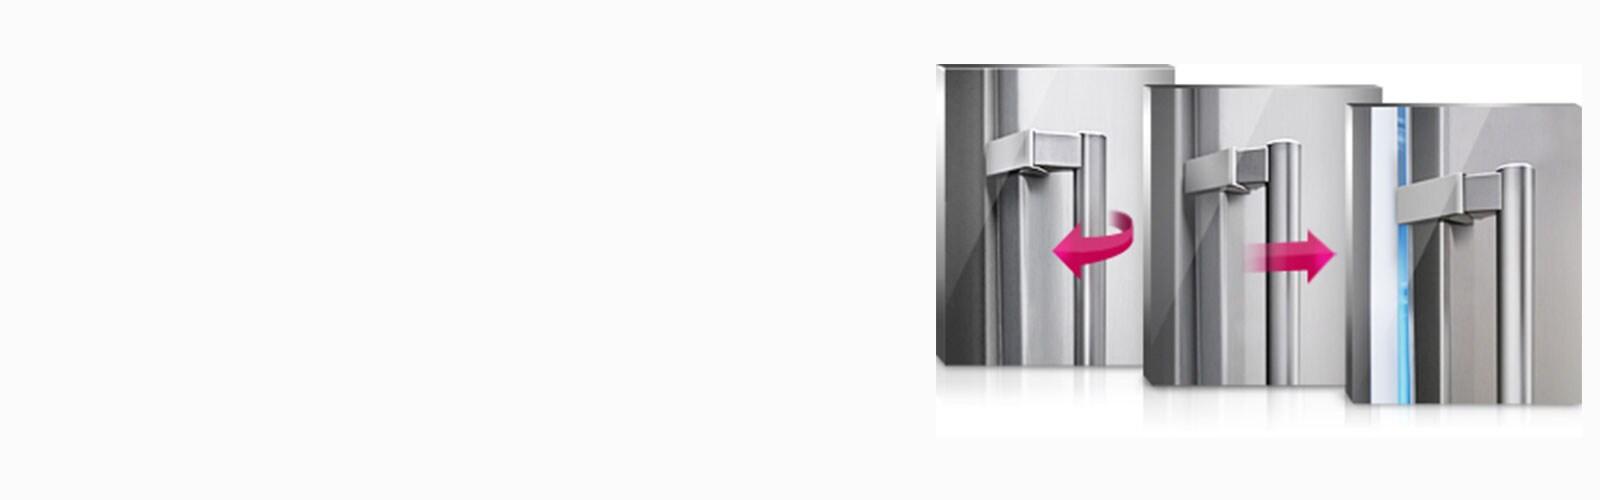 GC-F401ELDZ_lg-refrigerator-lansen-feature_Easy_Open_Handle_D_11072019